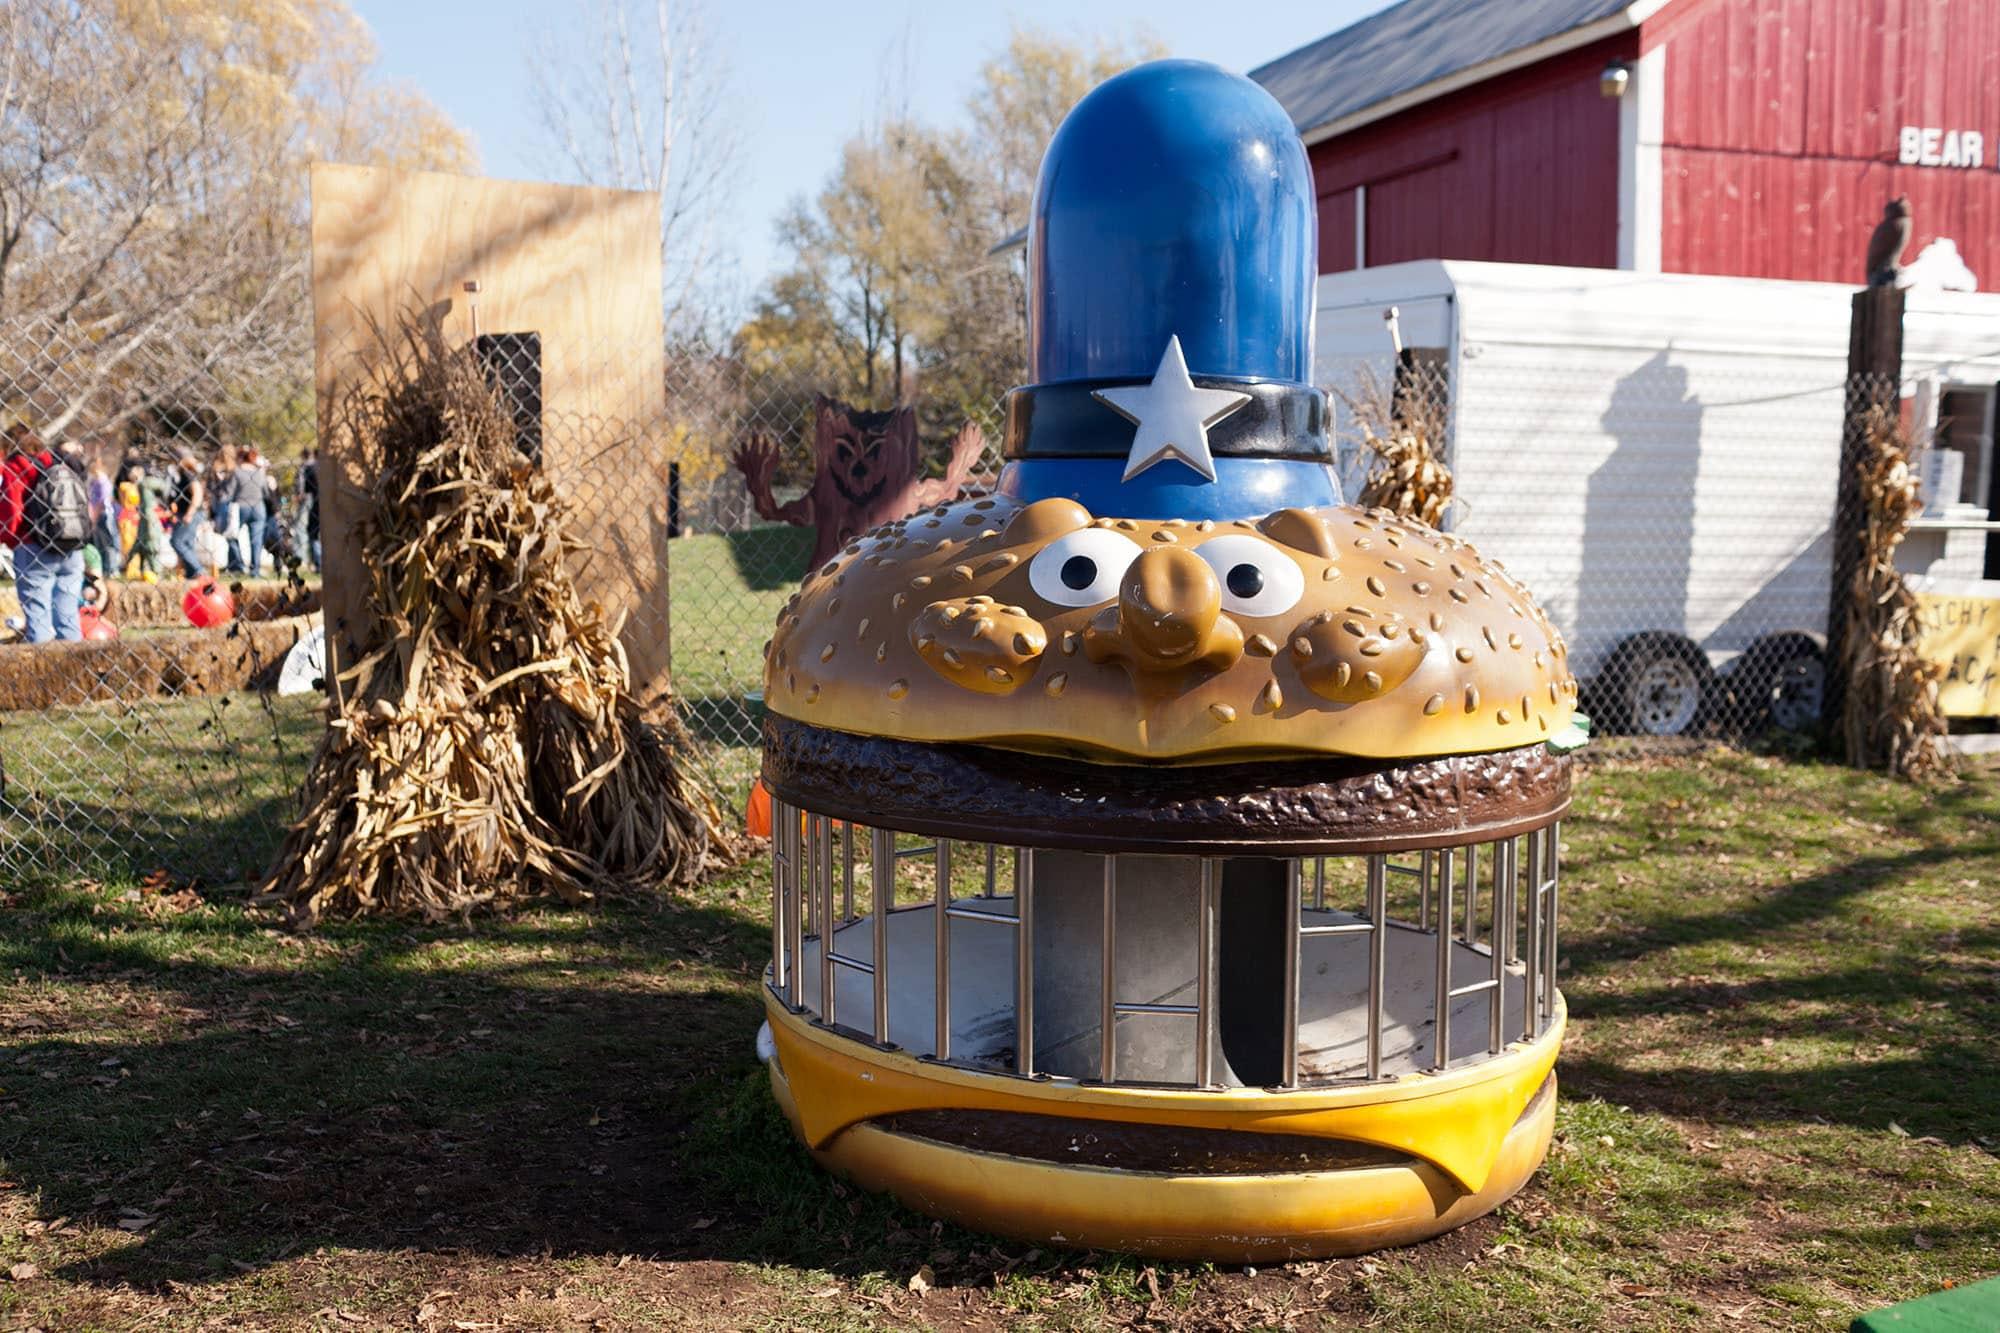 GIant hamburger at Bear Den Zoo Pumpkin Farm in Wisconsin